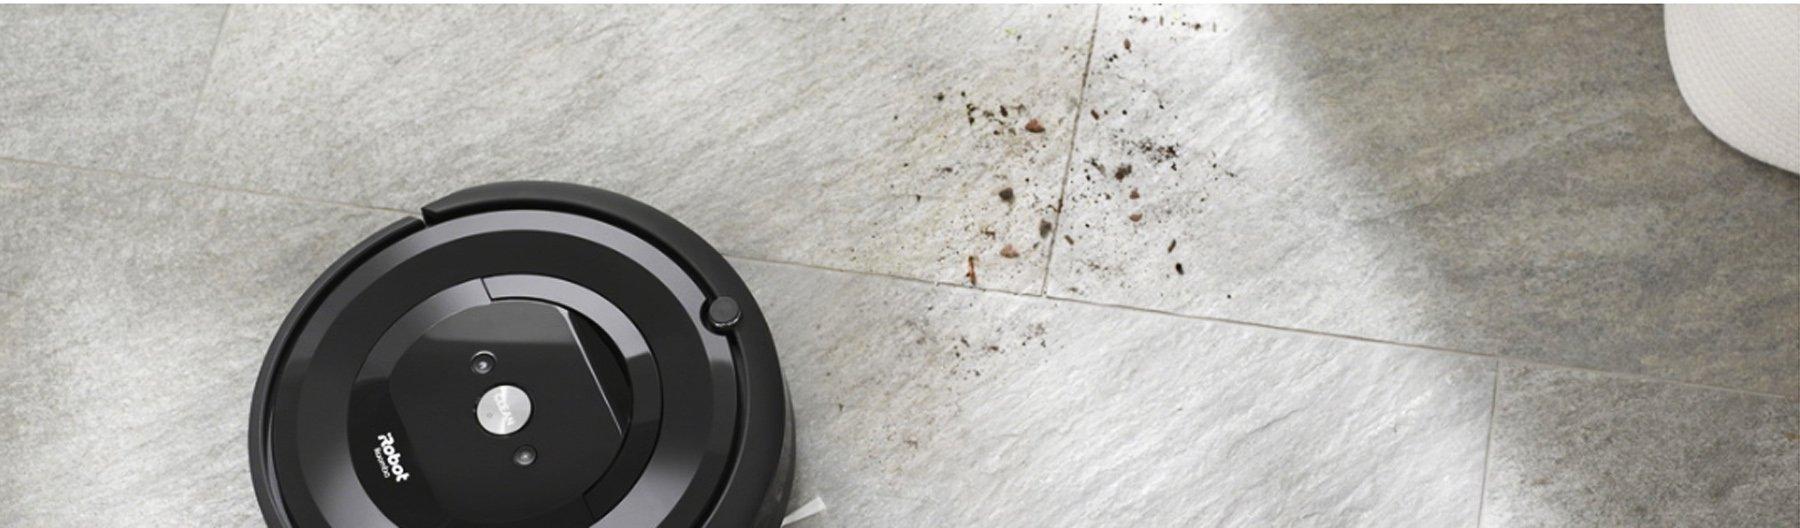 iRobot Roomba e5 распознает более загрязнённые участки